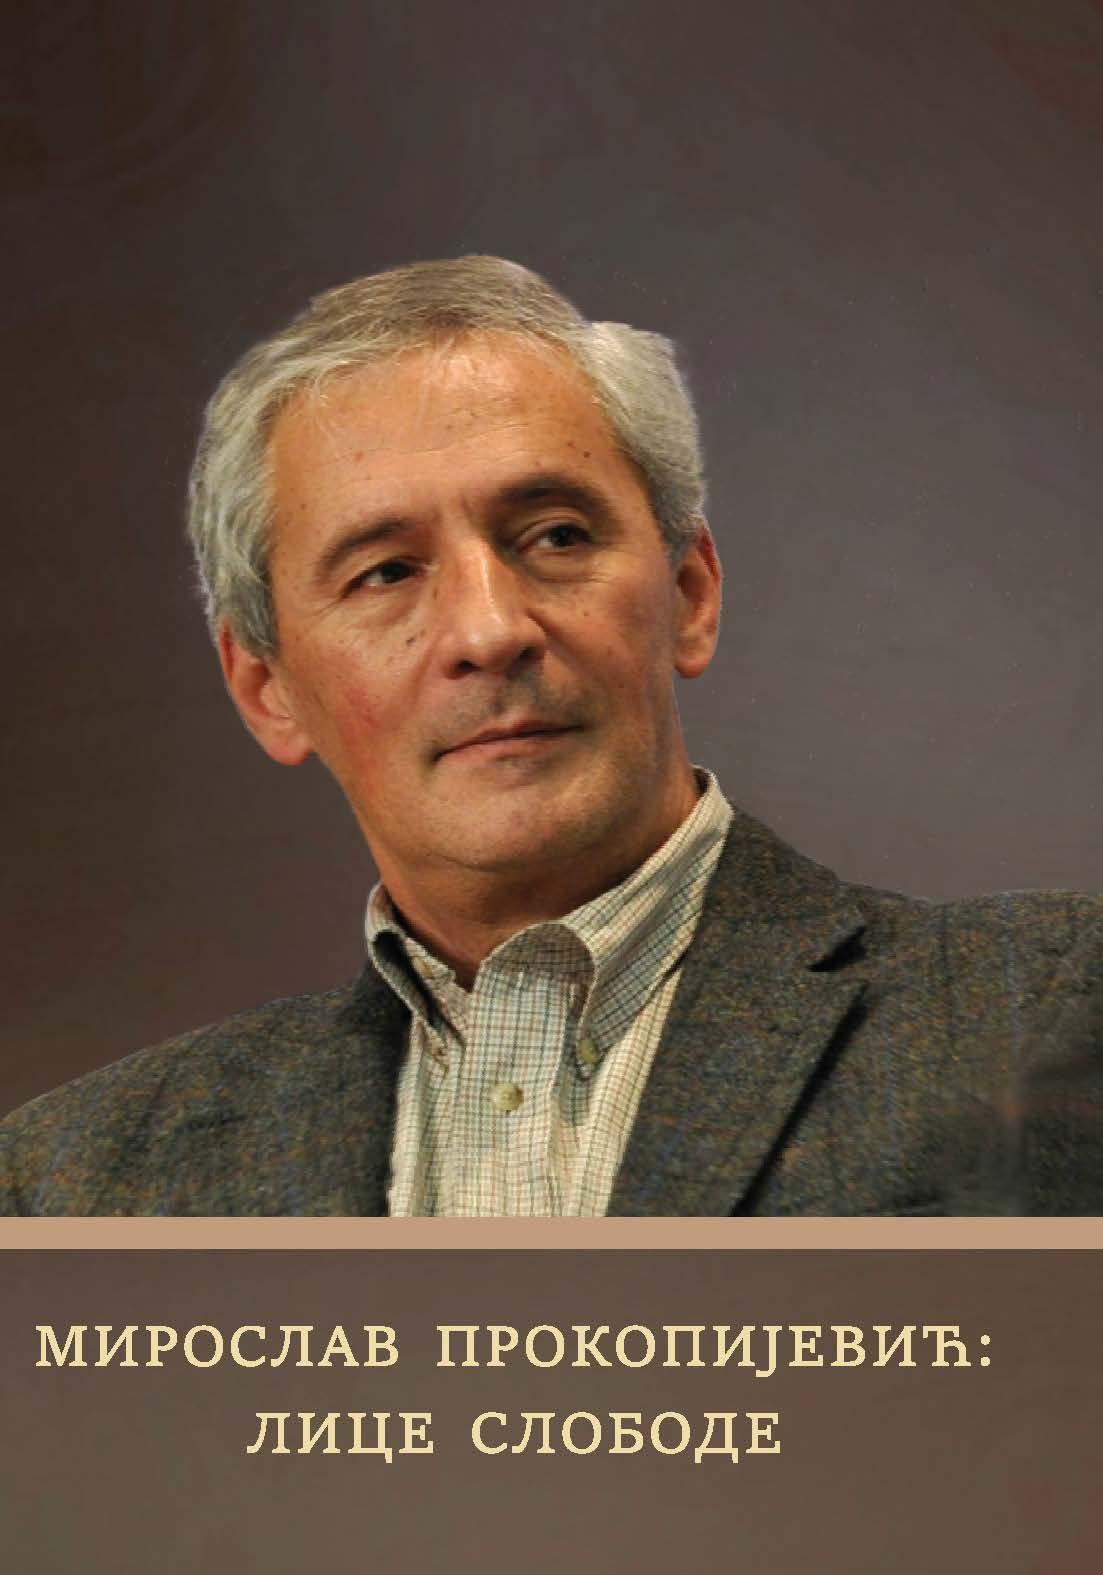 Miroslav Prokopijević: The Face of Freedom, Toplički centar za demokratiju i ljudska prava and the Institute of European Studies, Prokuplje and Belgrade, 2019.